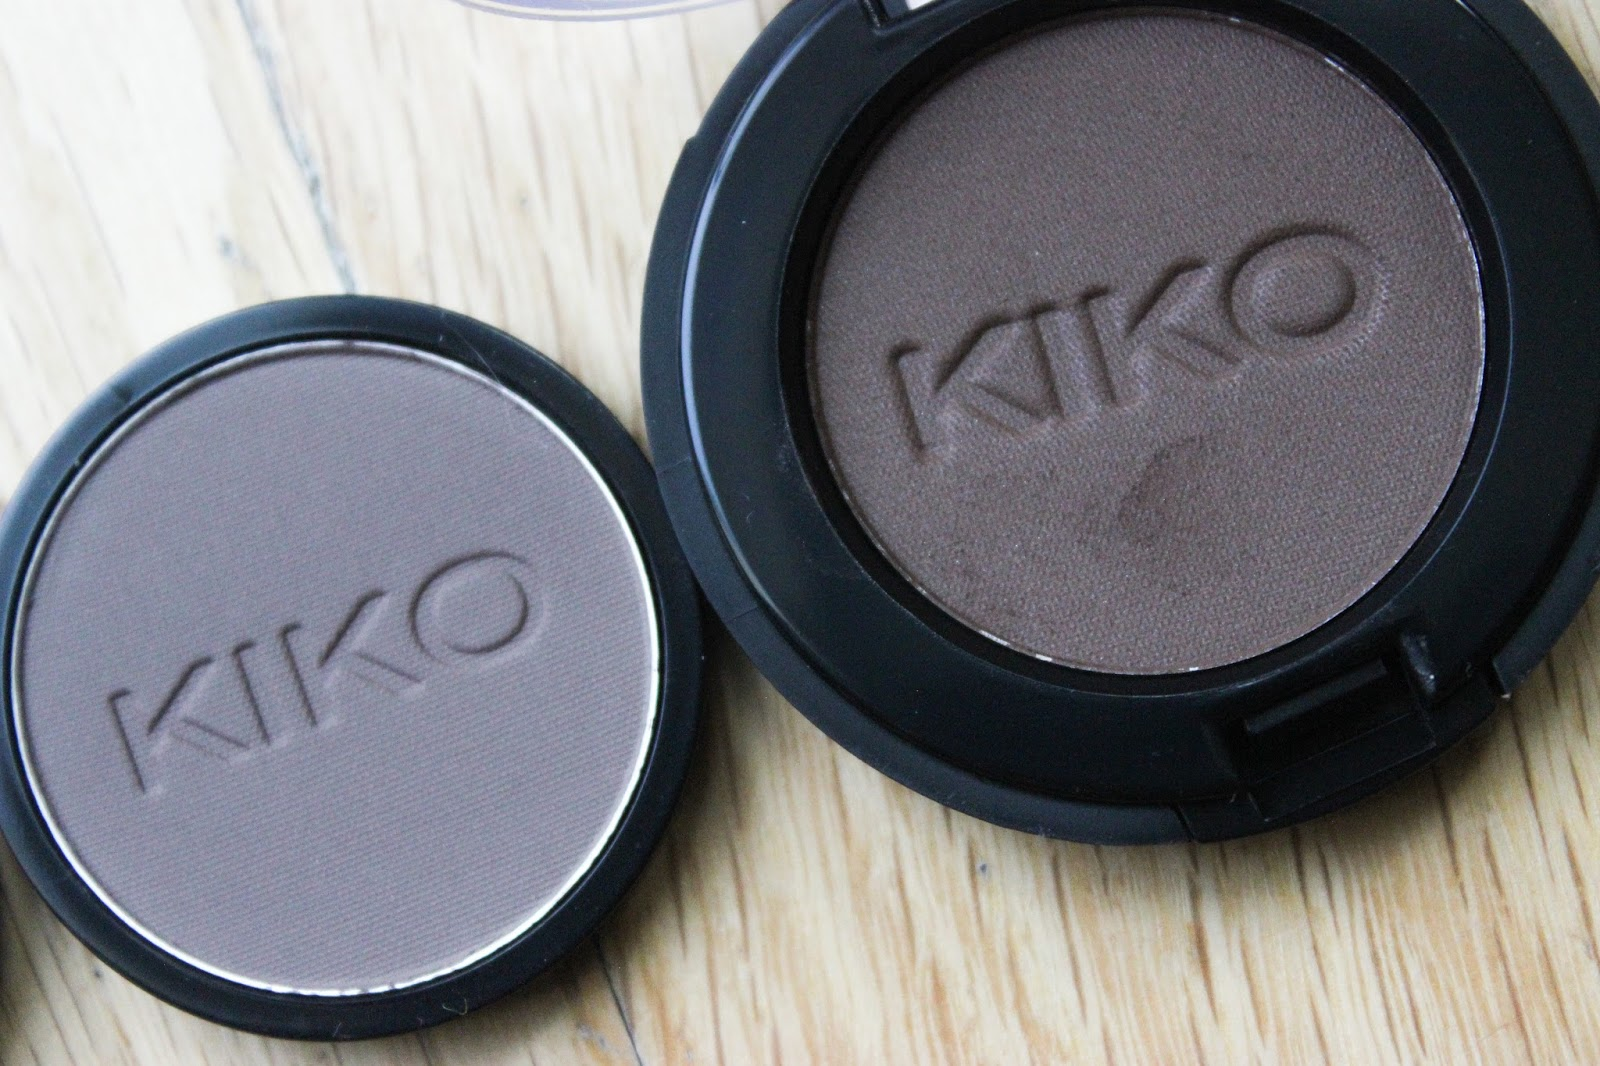 kiko infinity shadows discoveriesofself blog, nataliekayo, beauty blogger, swatches